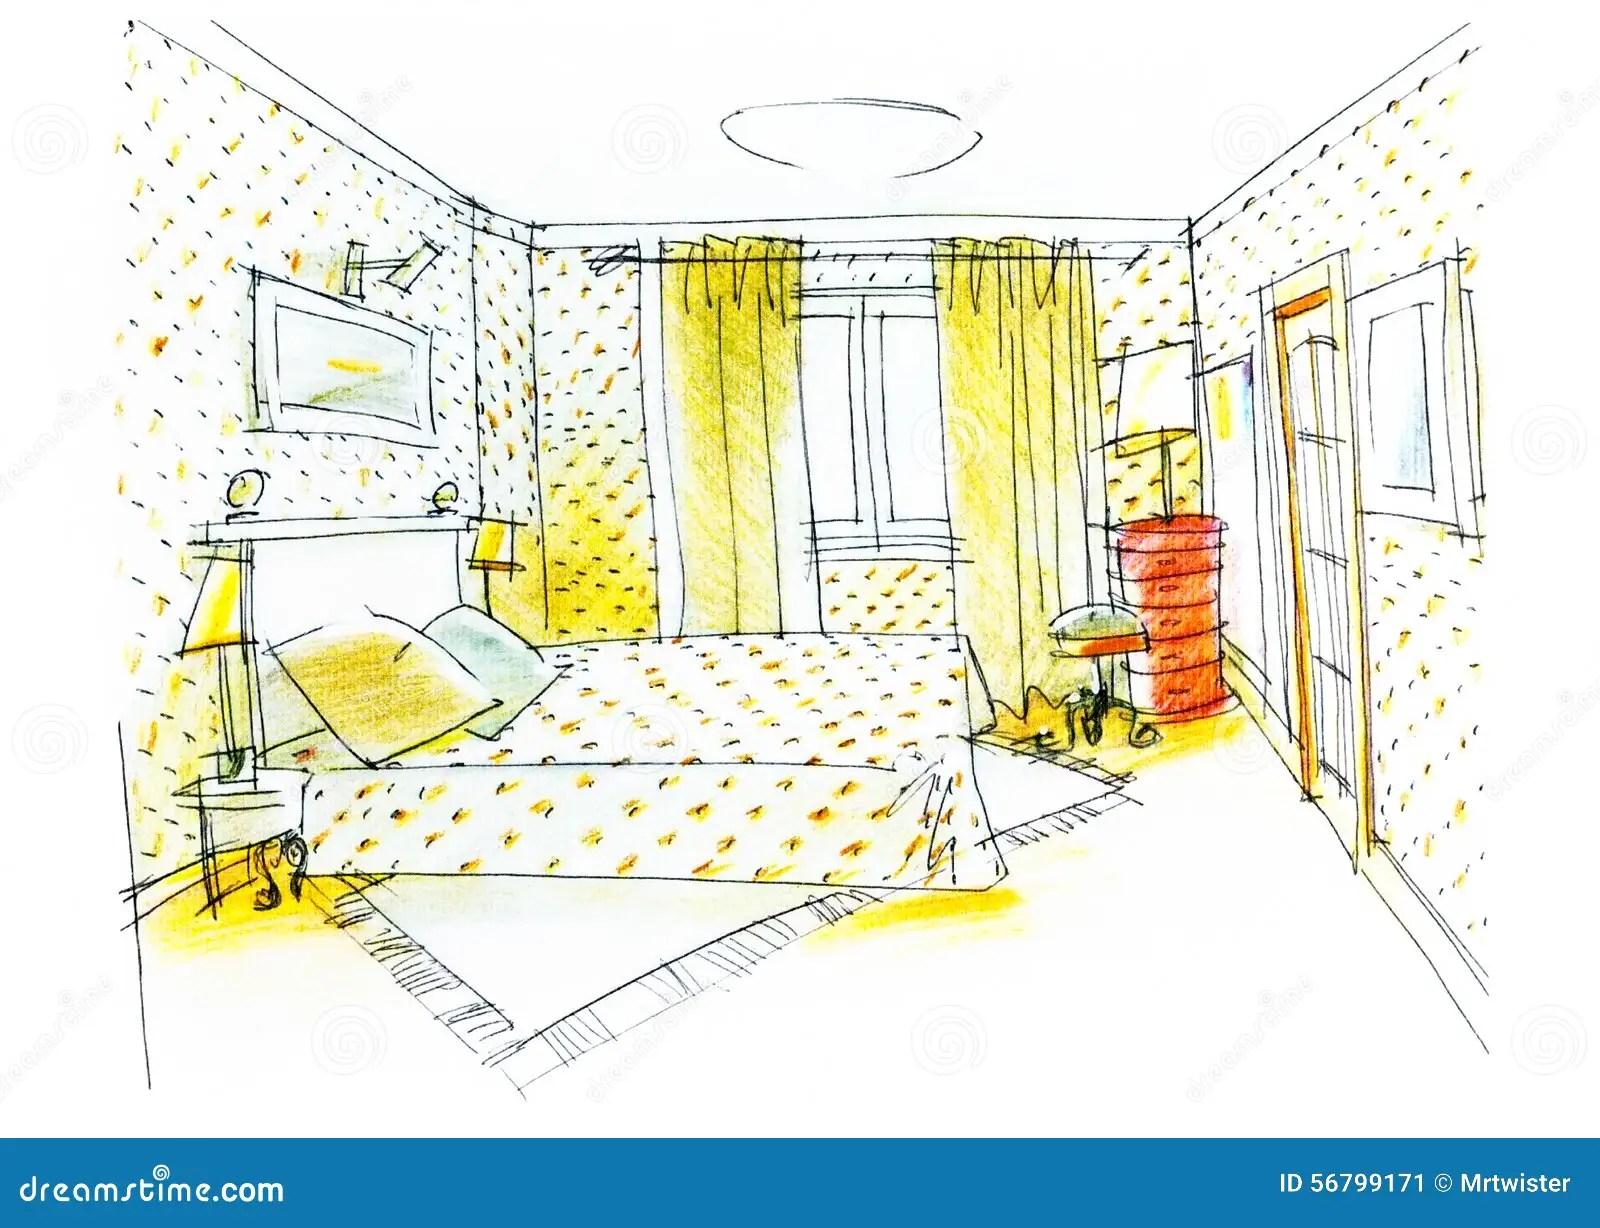 Chambre 3d Dessin | 46 Ides Dimages De Dessin 3d Chambre